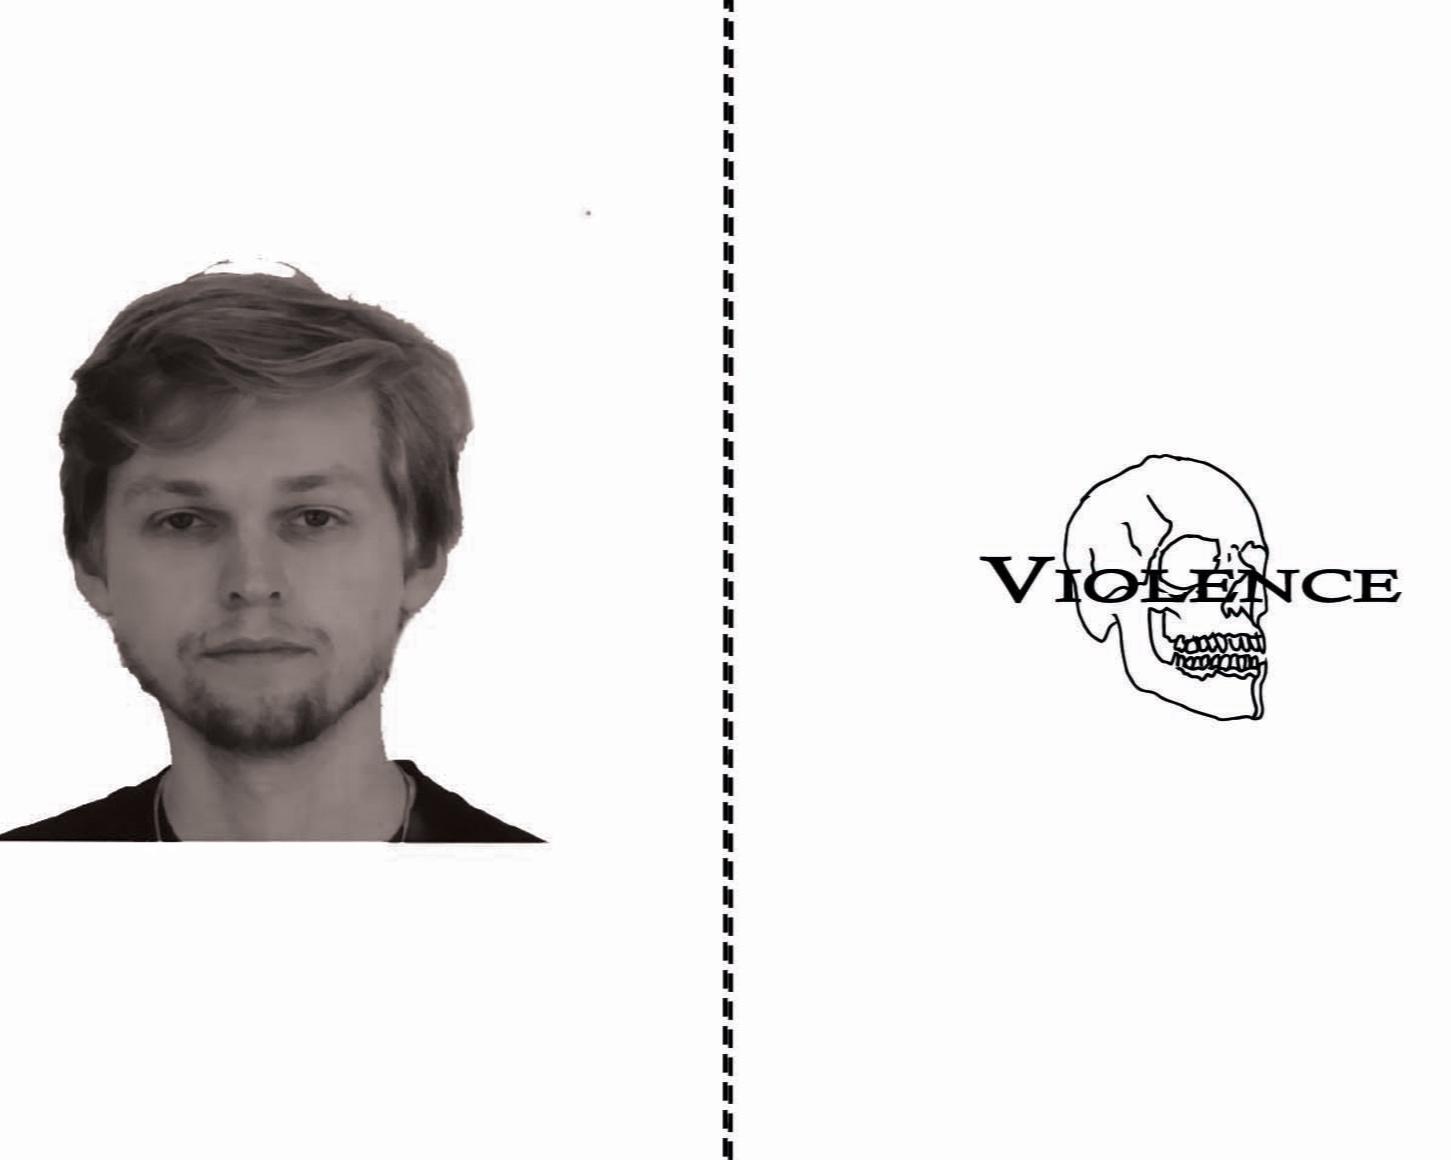 EVENT+-+WEBSITE+PROFILE+PAGE+-+violence.jpg